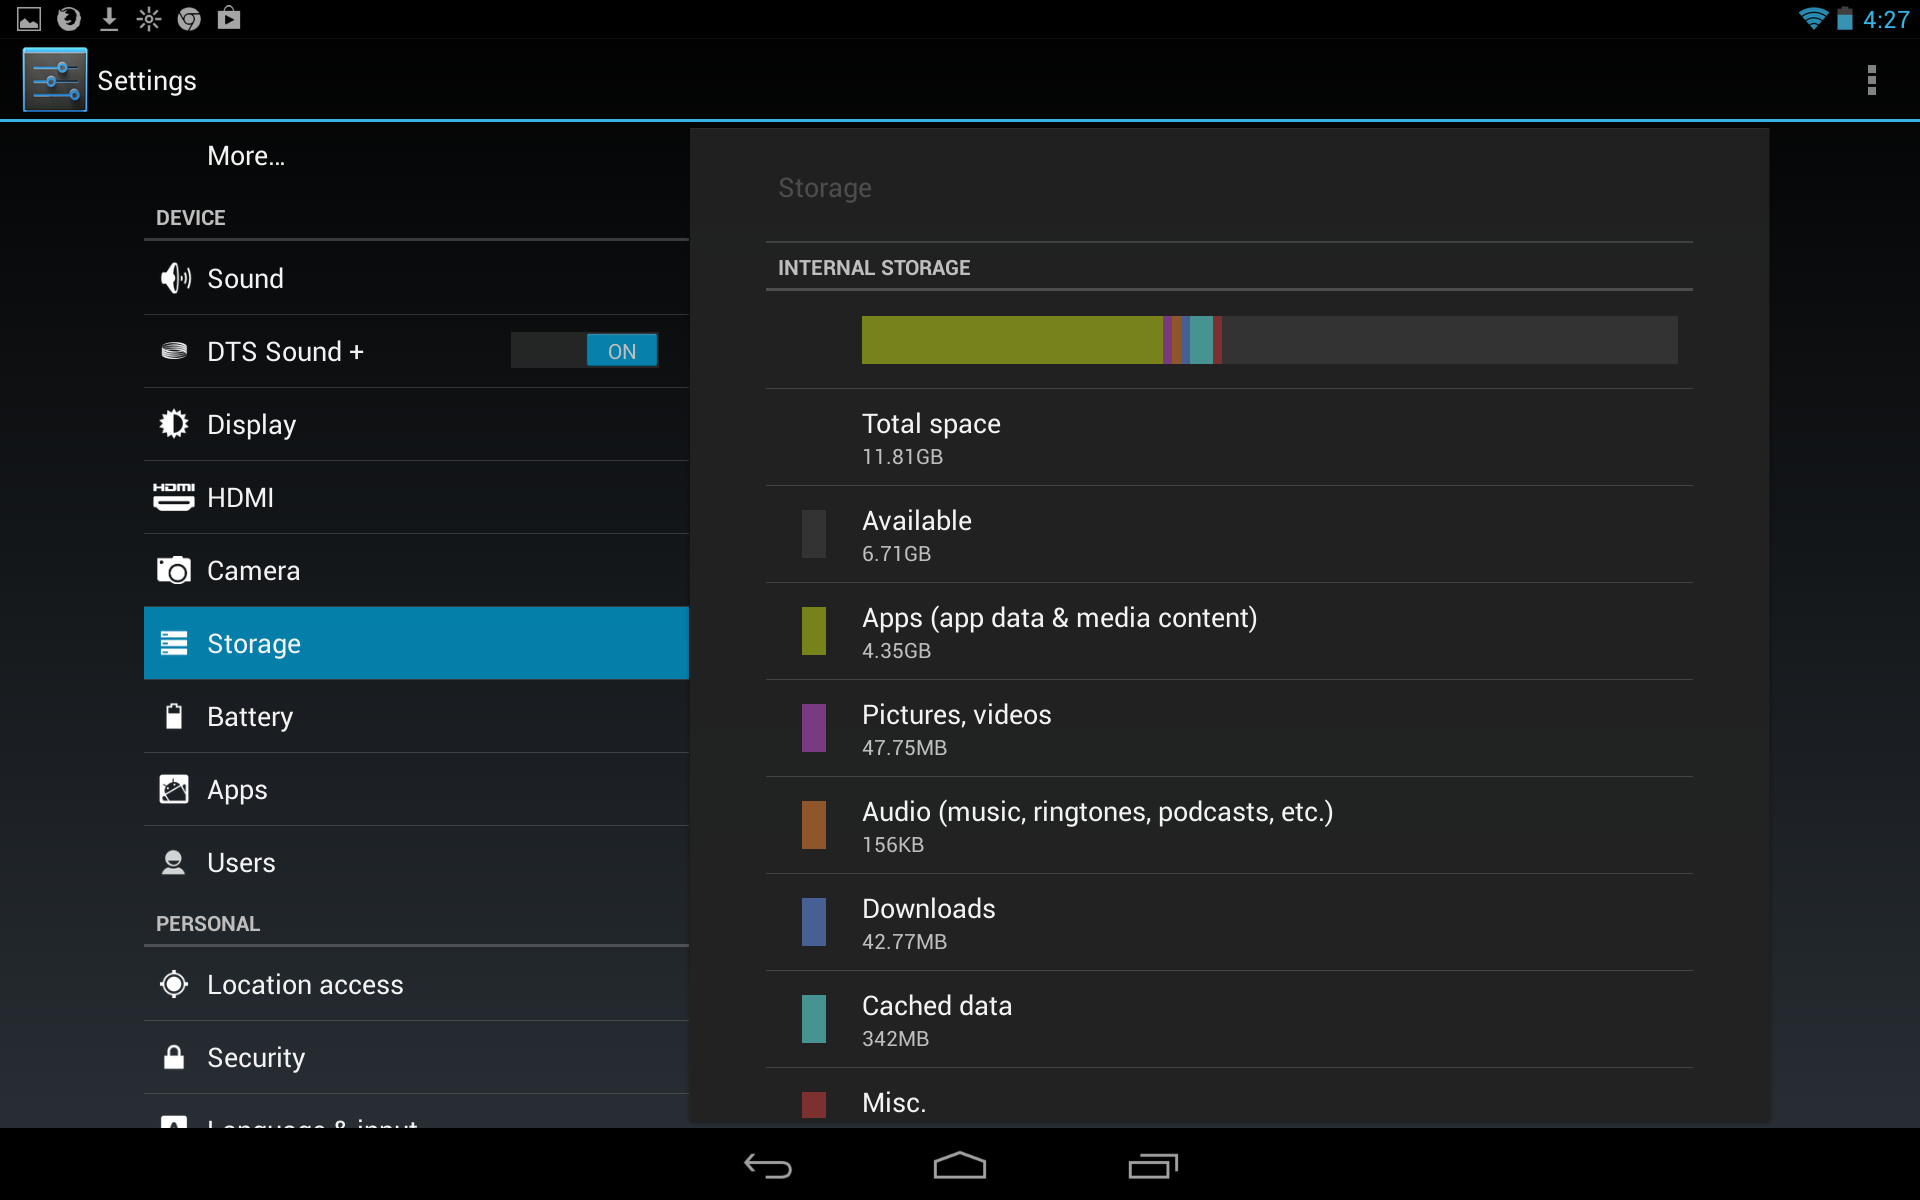 Review HP SlateBook x2 10-h010nr Tablet